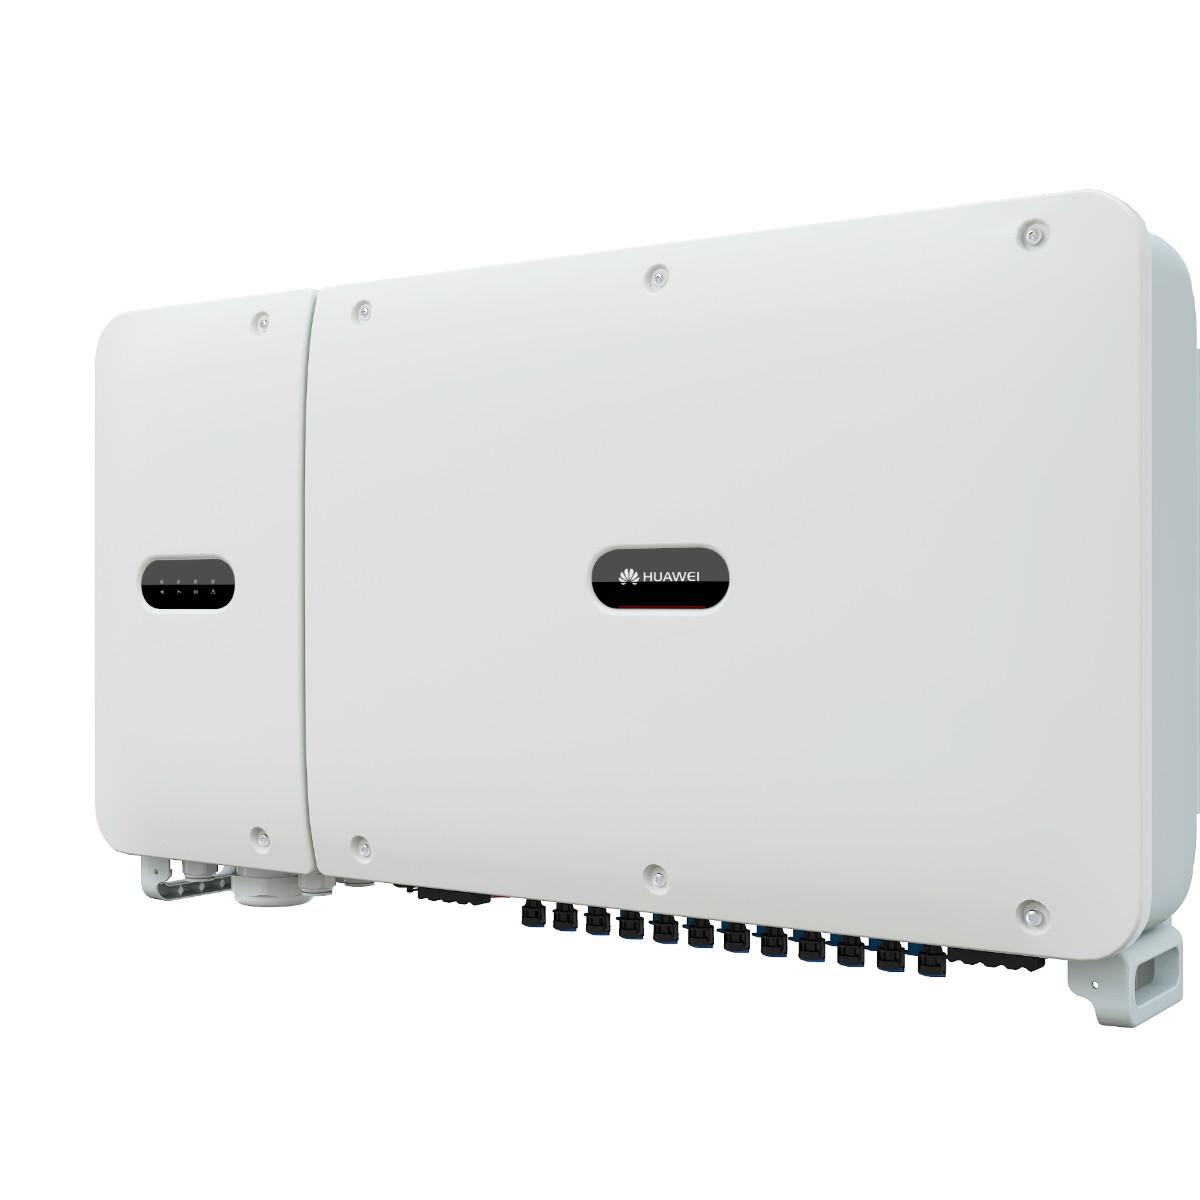 Huawei - SUN2000-H1 100 kW